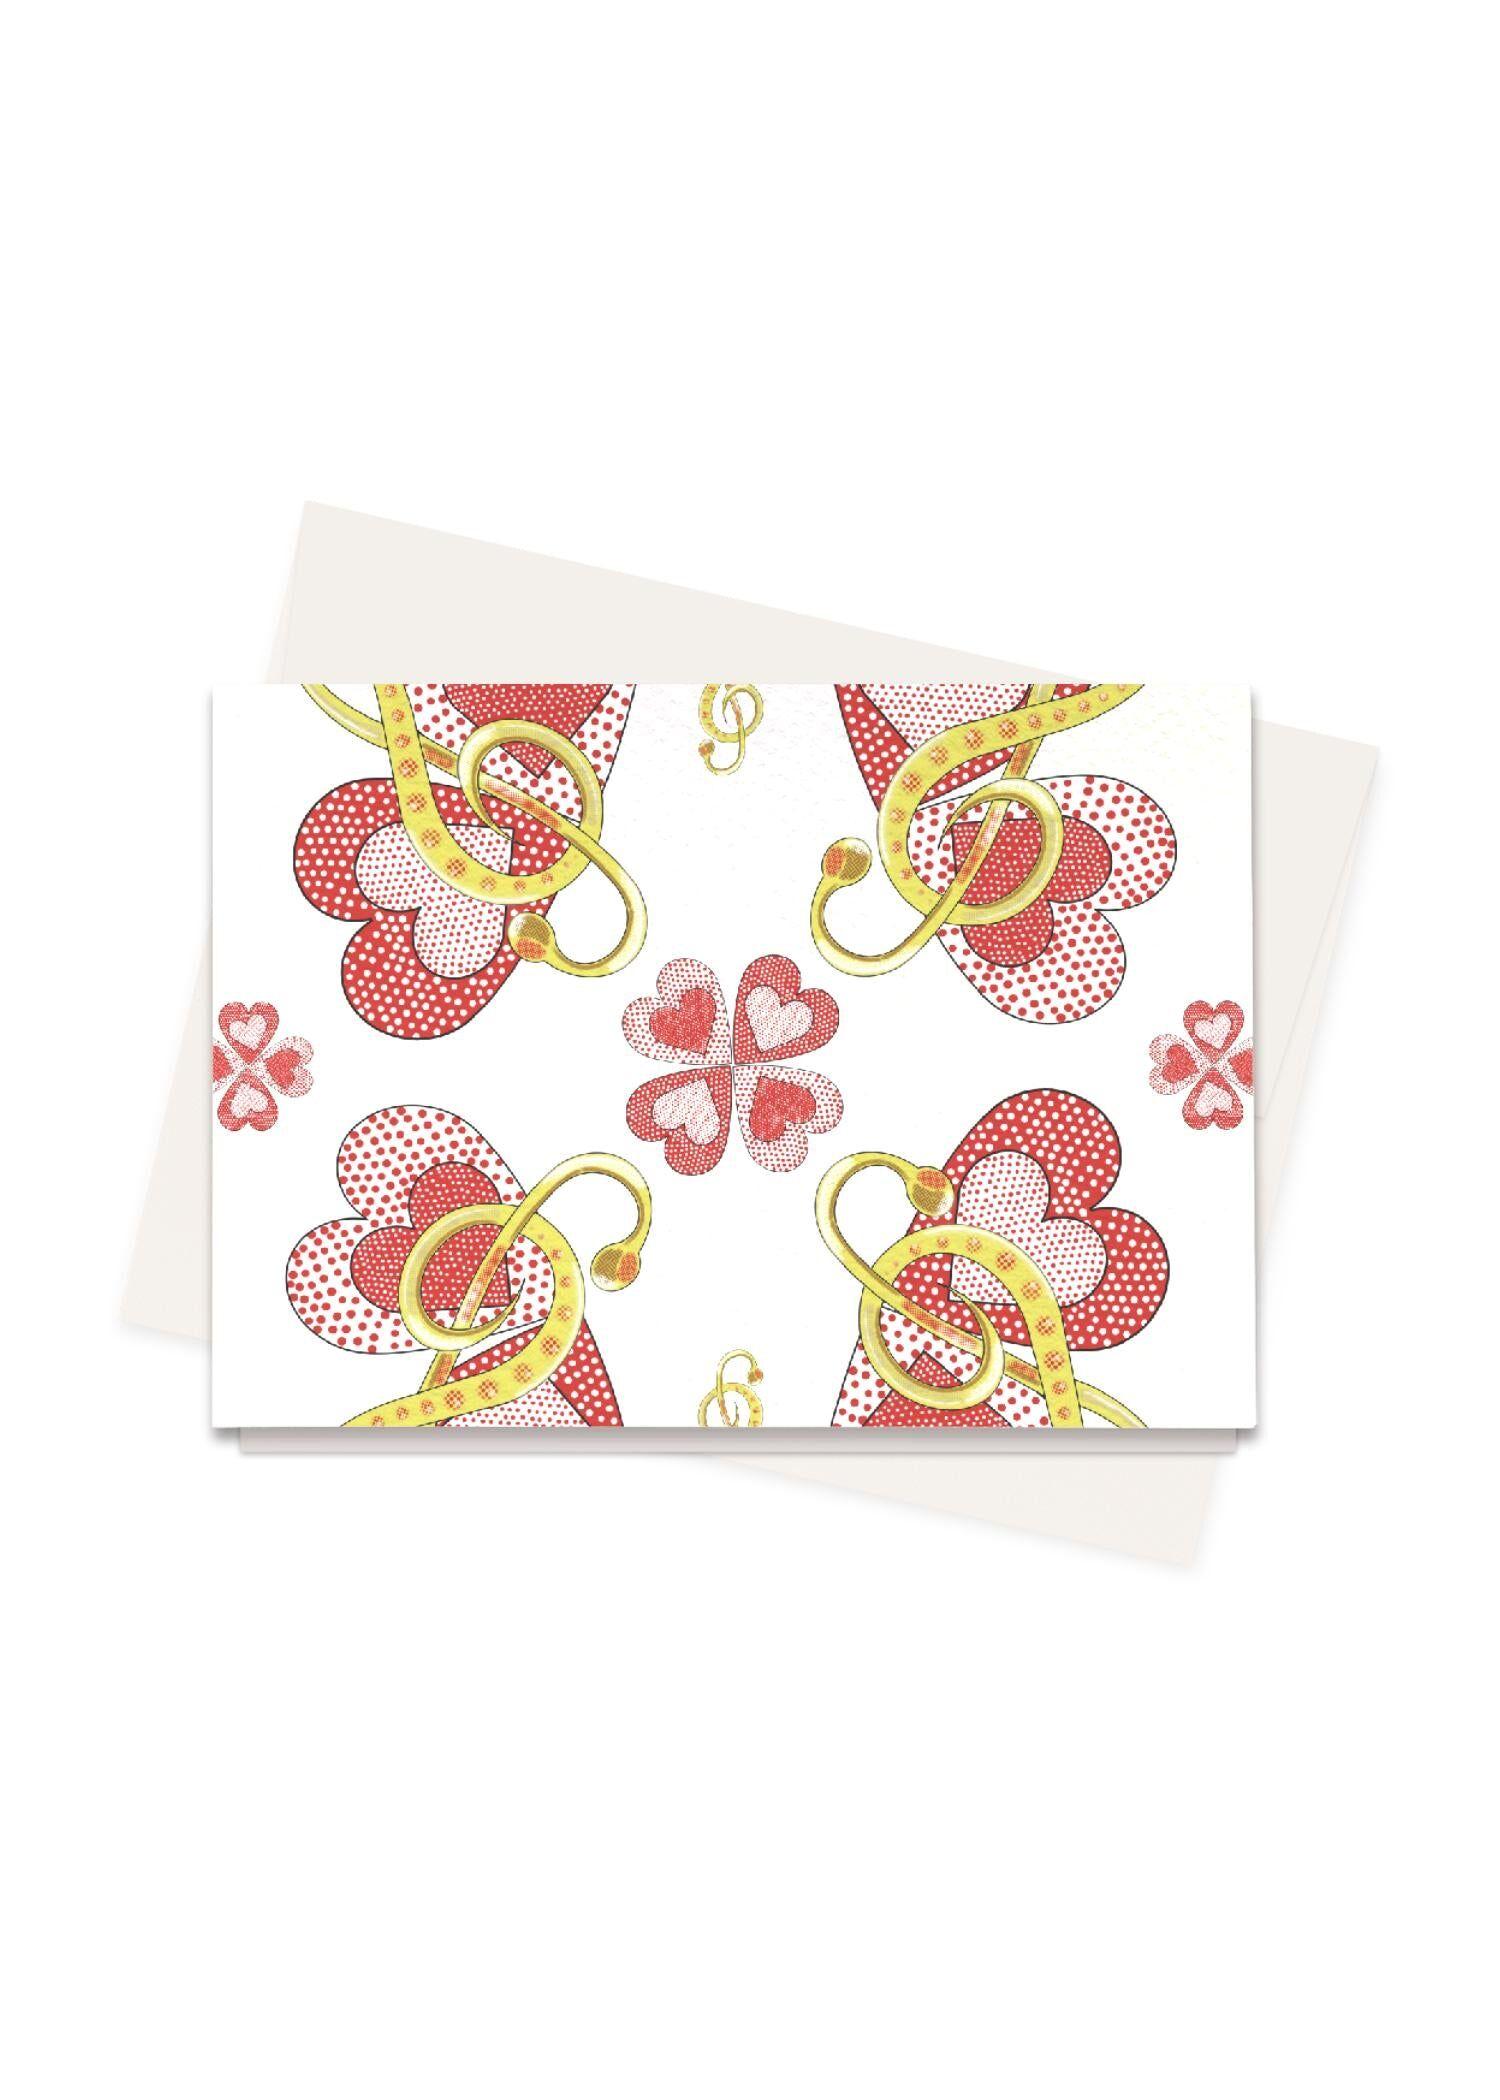 VIDA Greeting Cards Set - Music by VIDA Original Artist  - Size: Set of 16